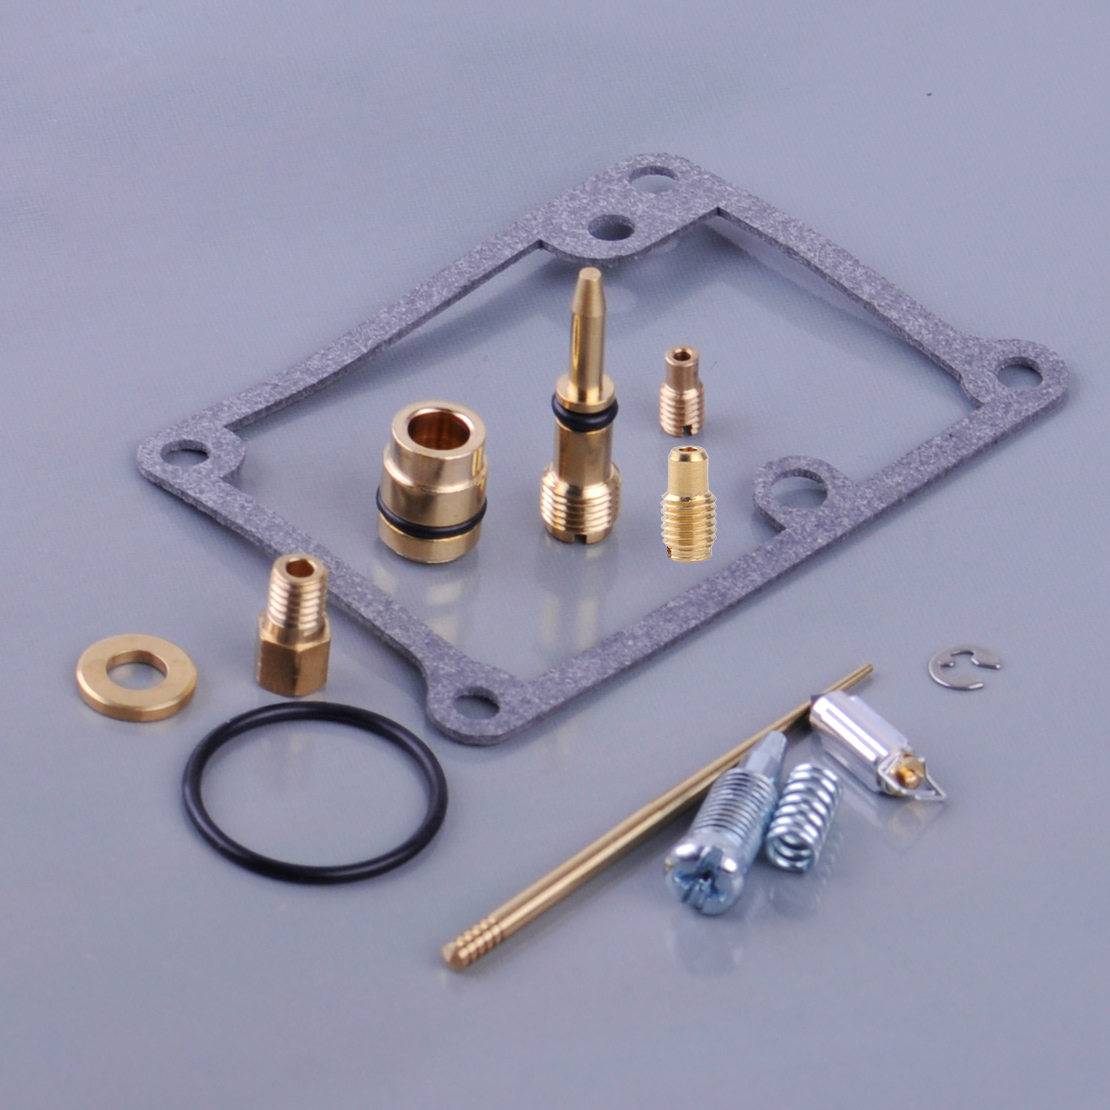 medium resolution of fuel system rebuild kits for yamaha banshee yfz350 carburetor carb rebuild kit repair yfz 350 2